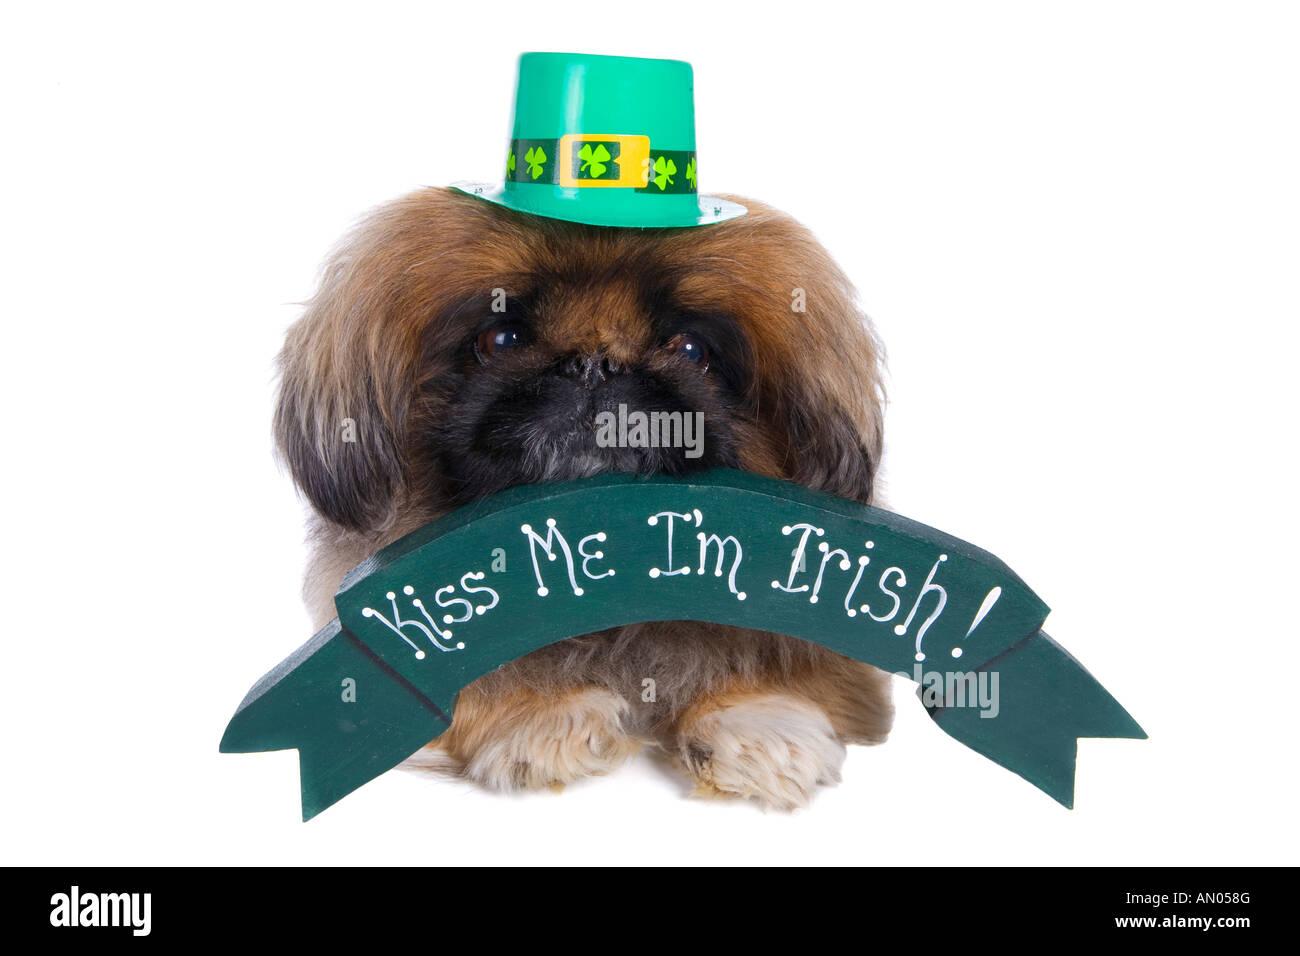 034eb19000b4 Pekingese dog with banner that say s Kiss me I m Irish wearing green hat  isolated